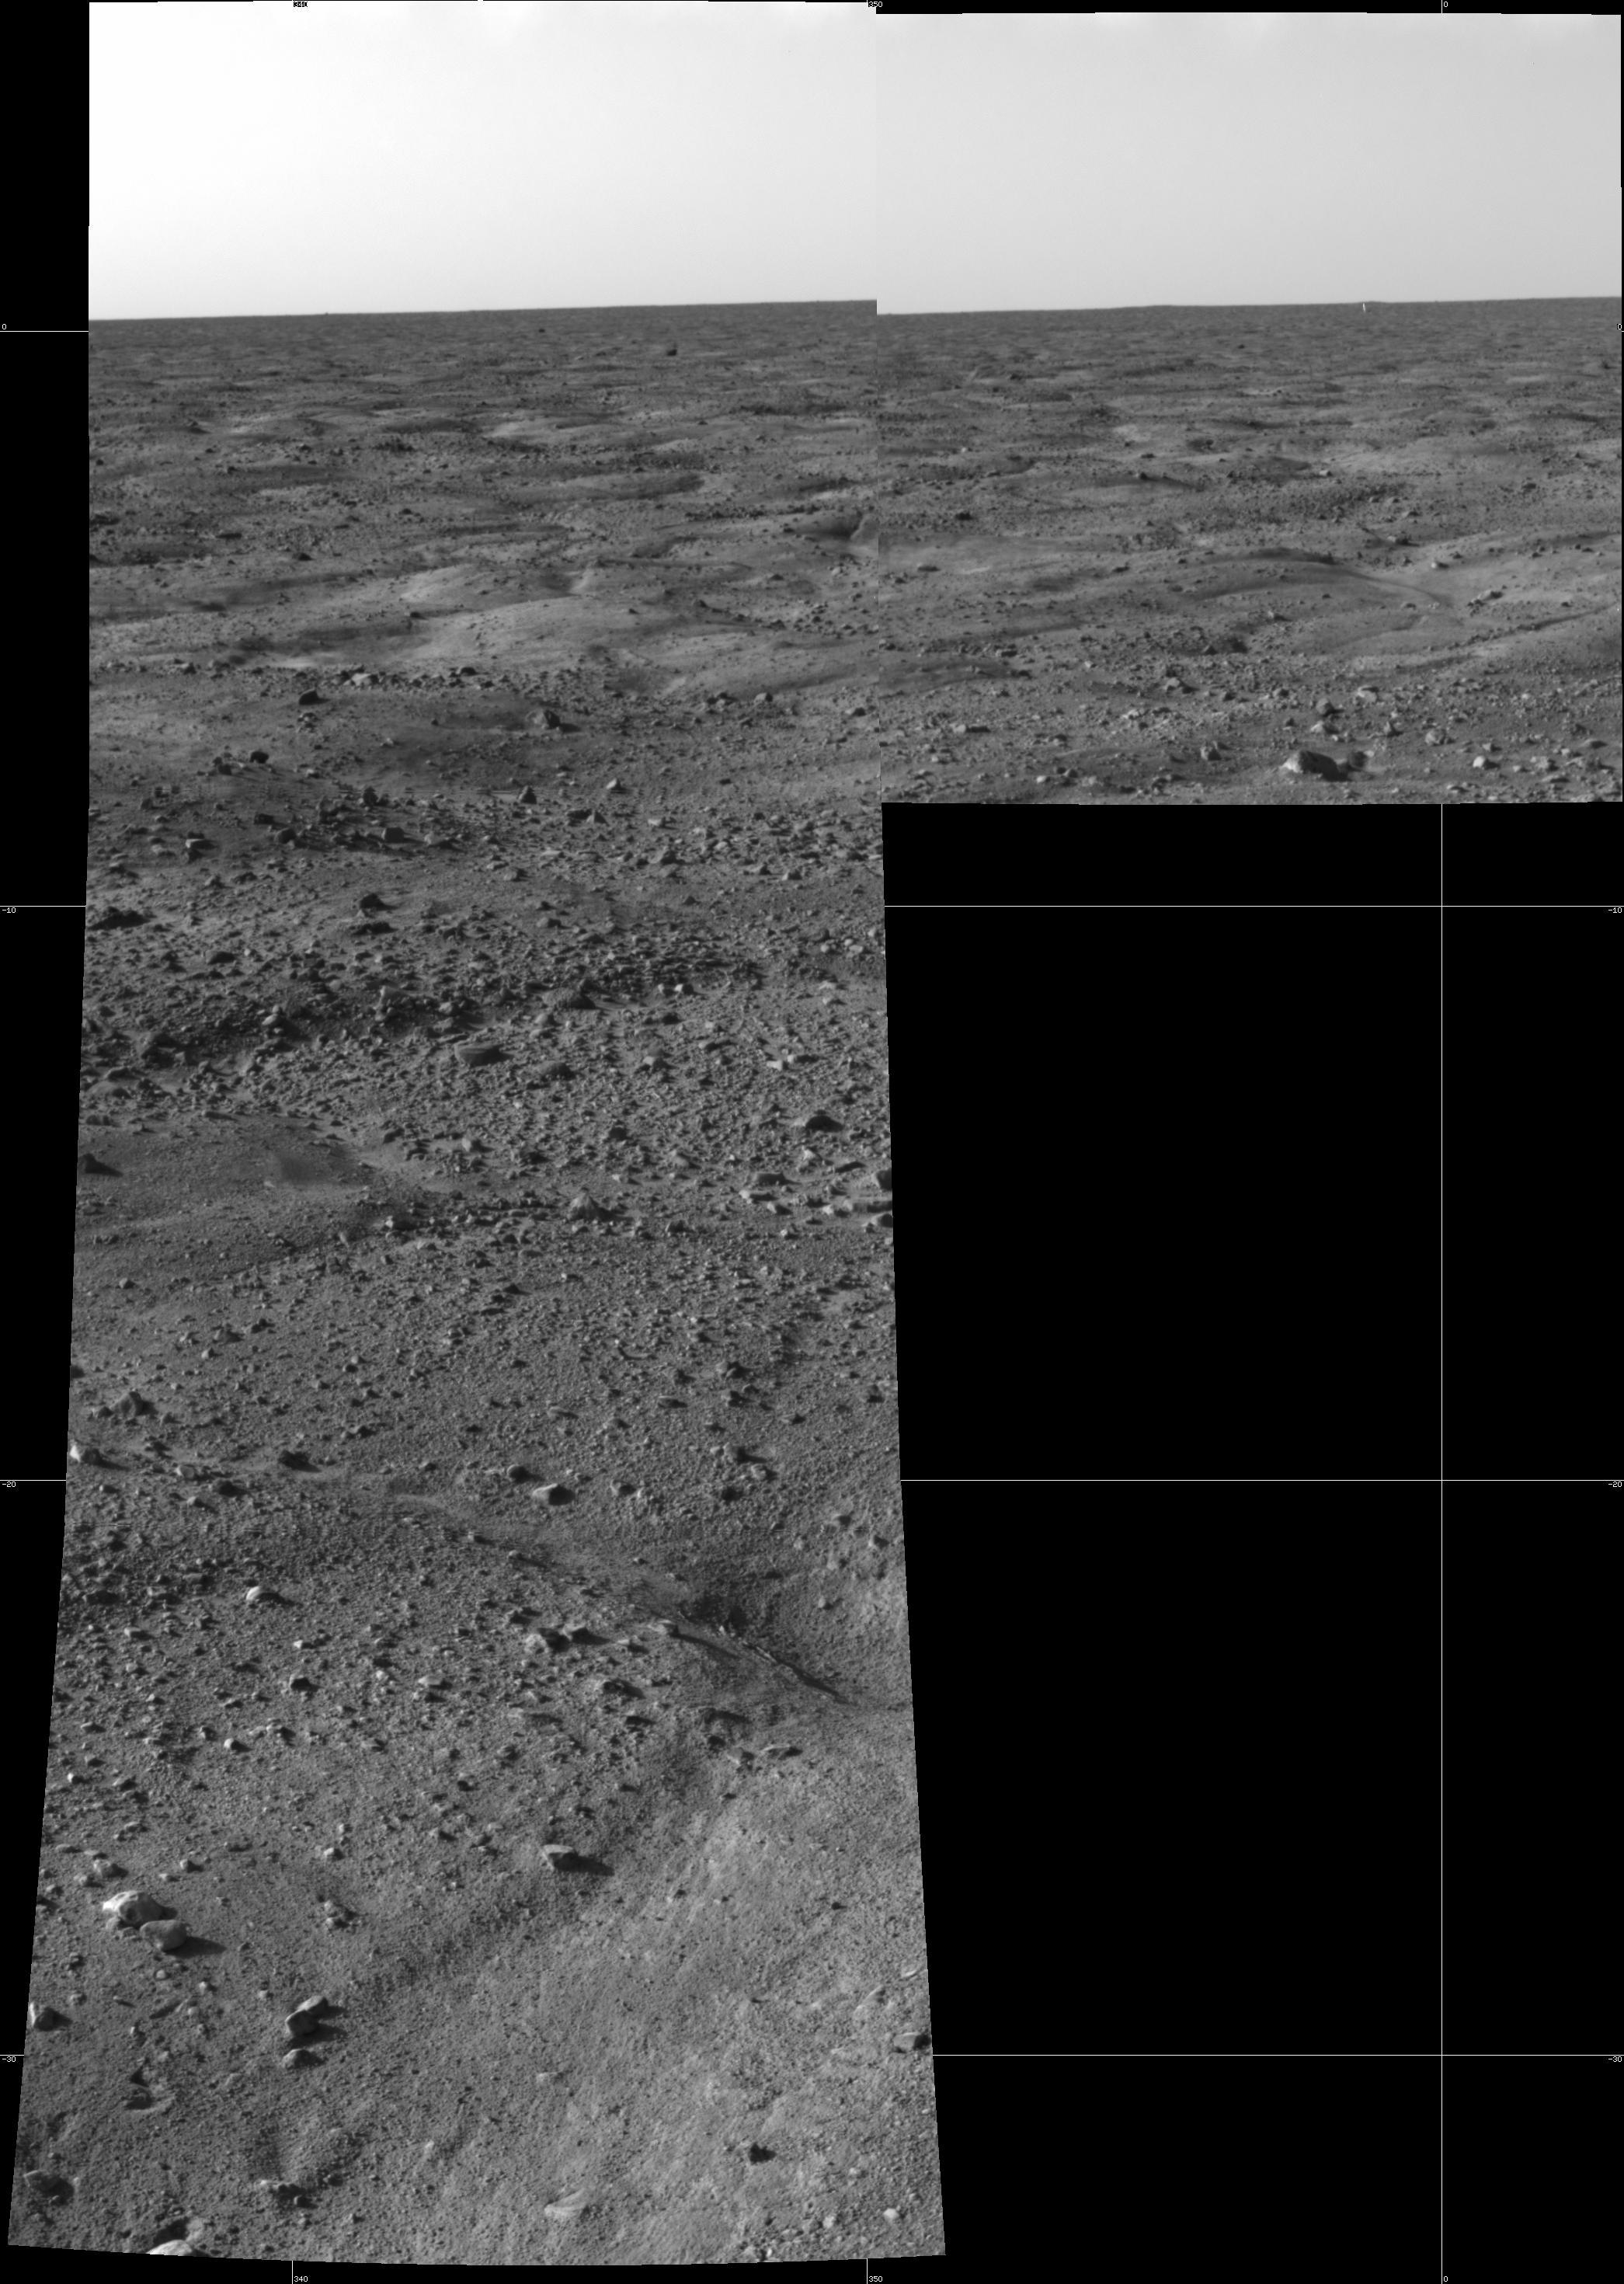 http://spaceflightnow.com/mars/phoenix/images/lg_334.jpg